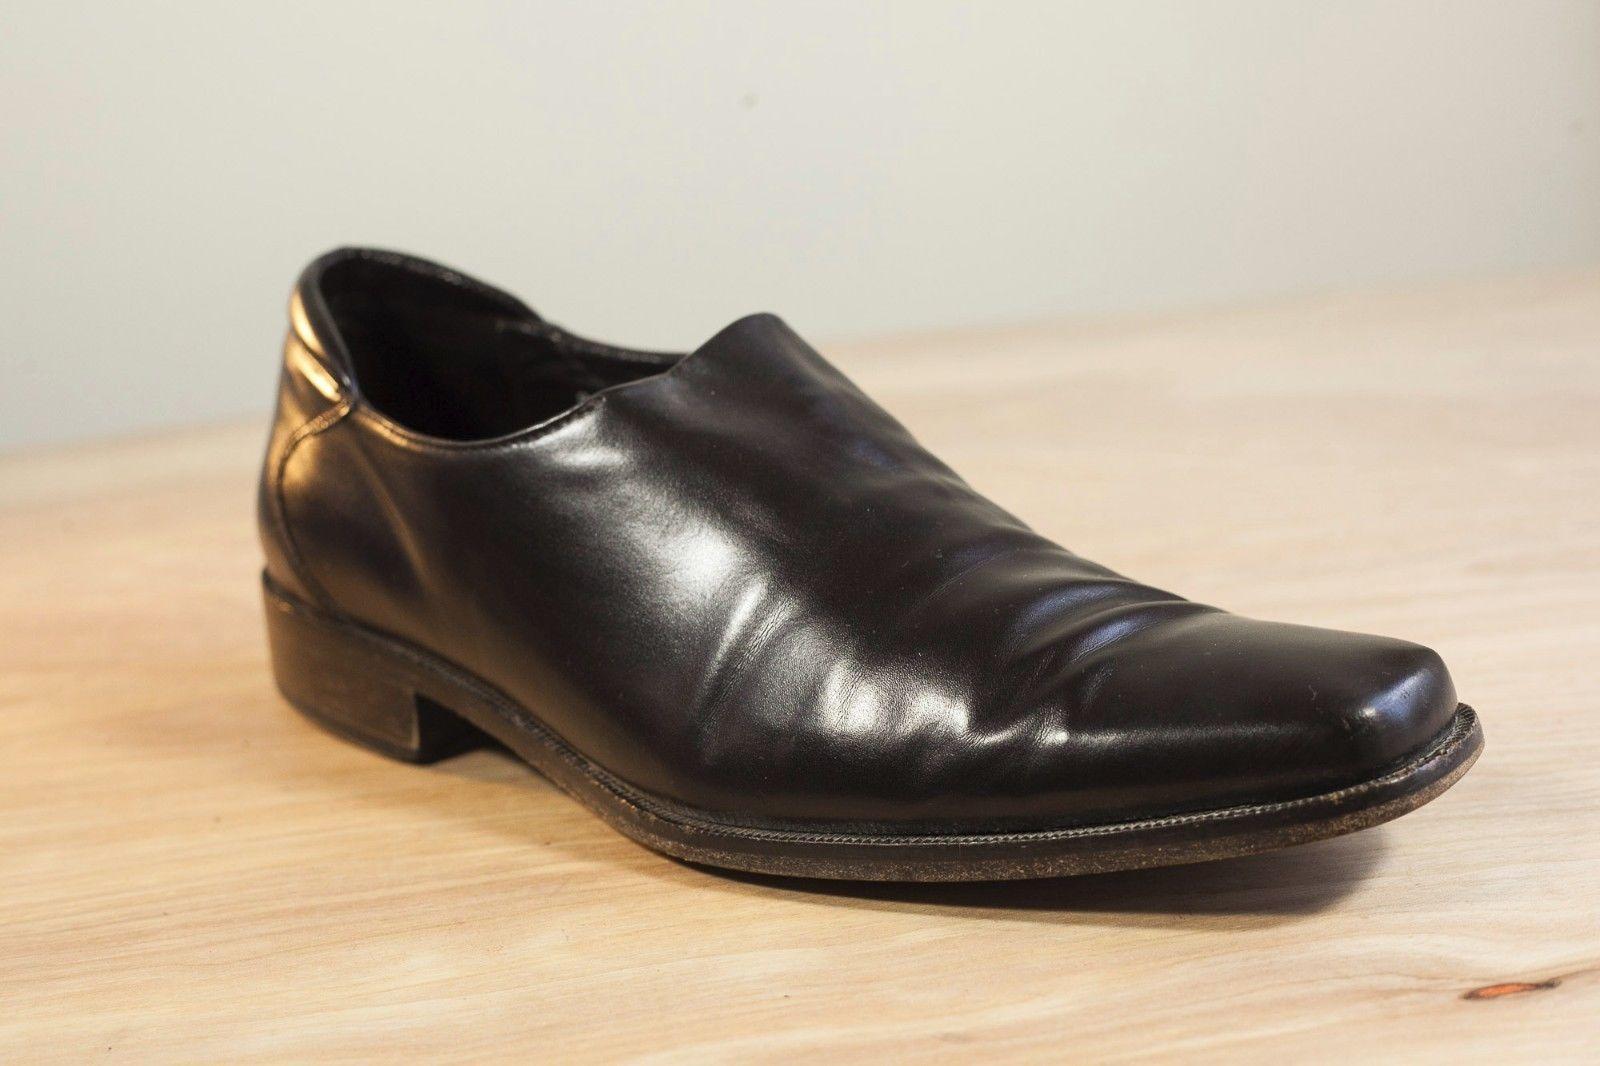 de88c3f7306 57. 57. Previous. Donald J Pliner Rex 8.5 Black Slip On Men s Stretch  Loafer Nappa Leather · Donald ...